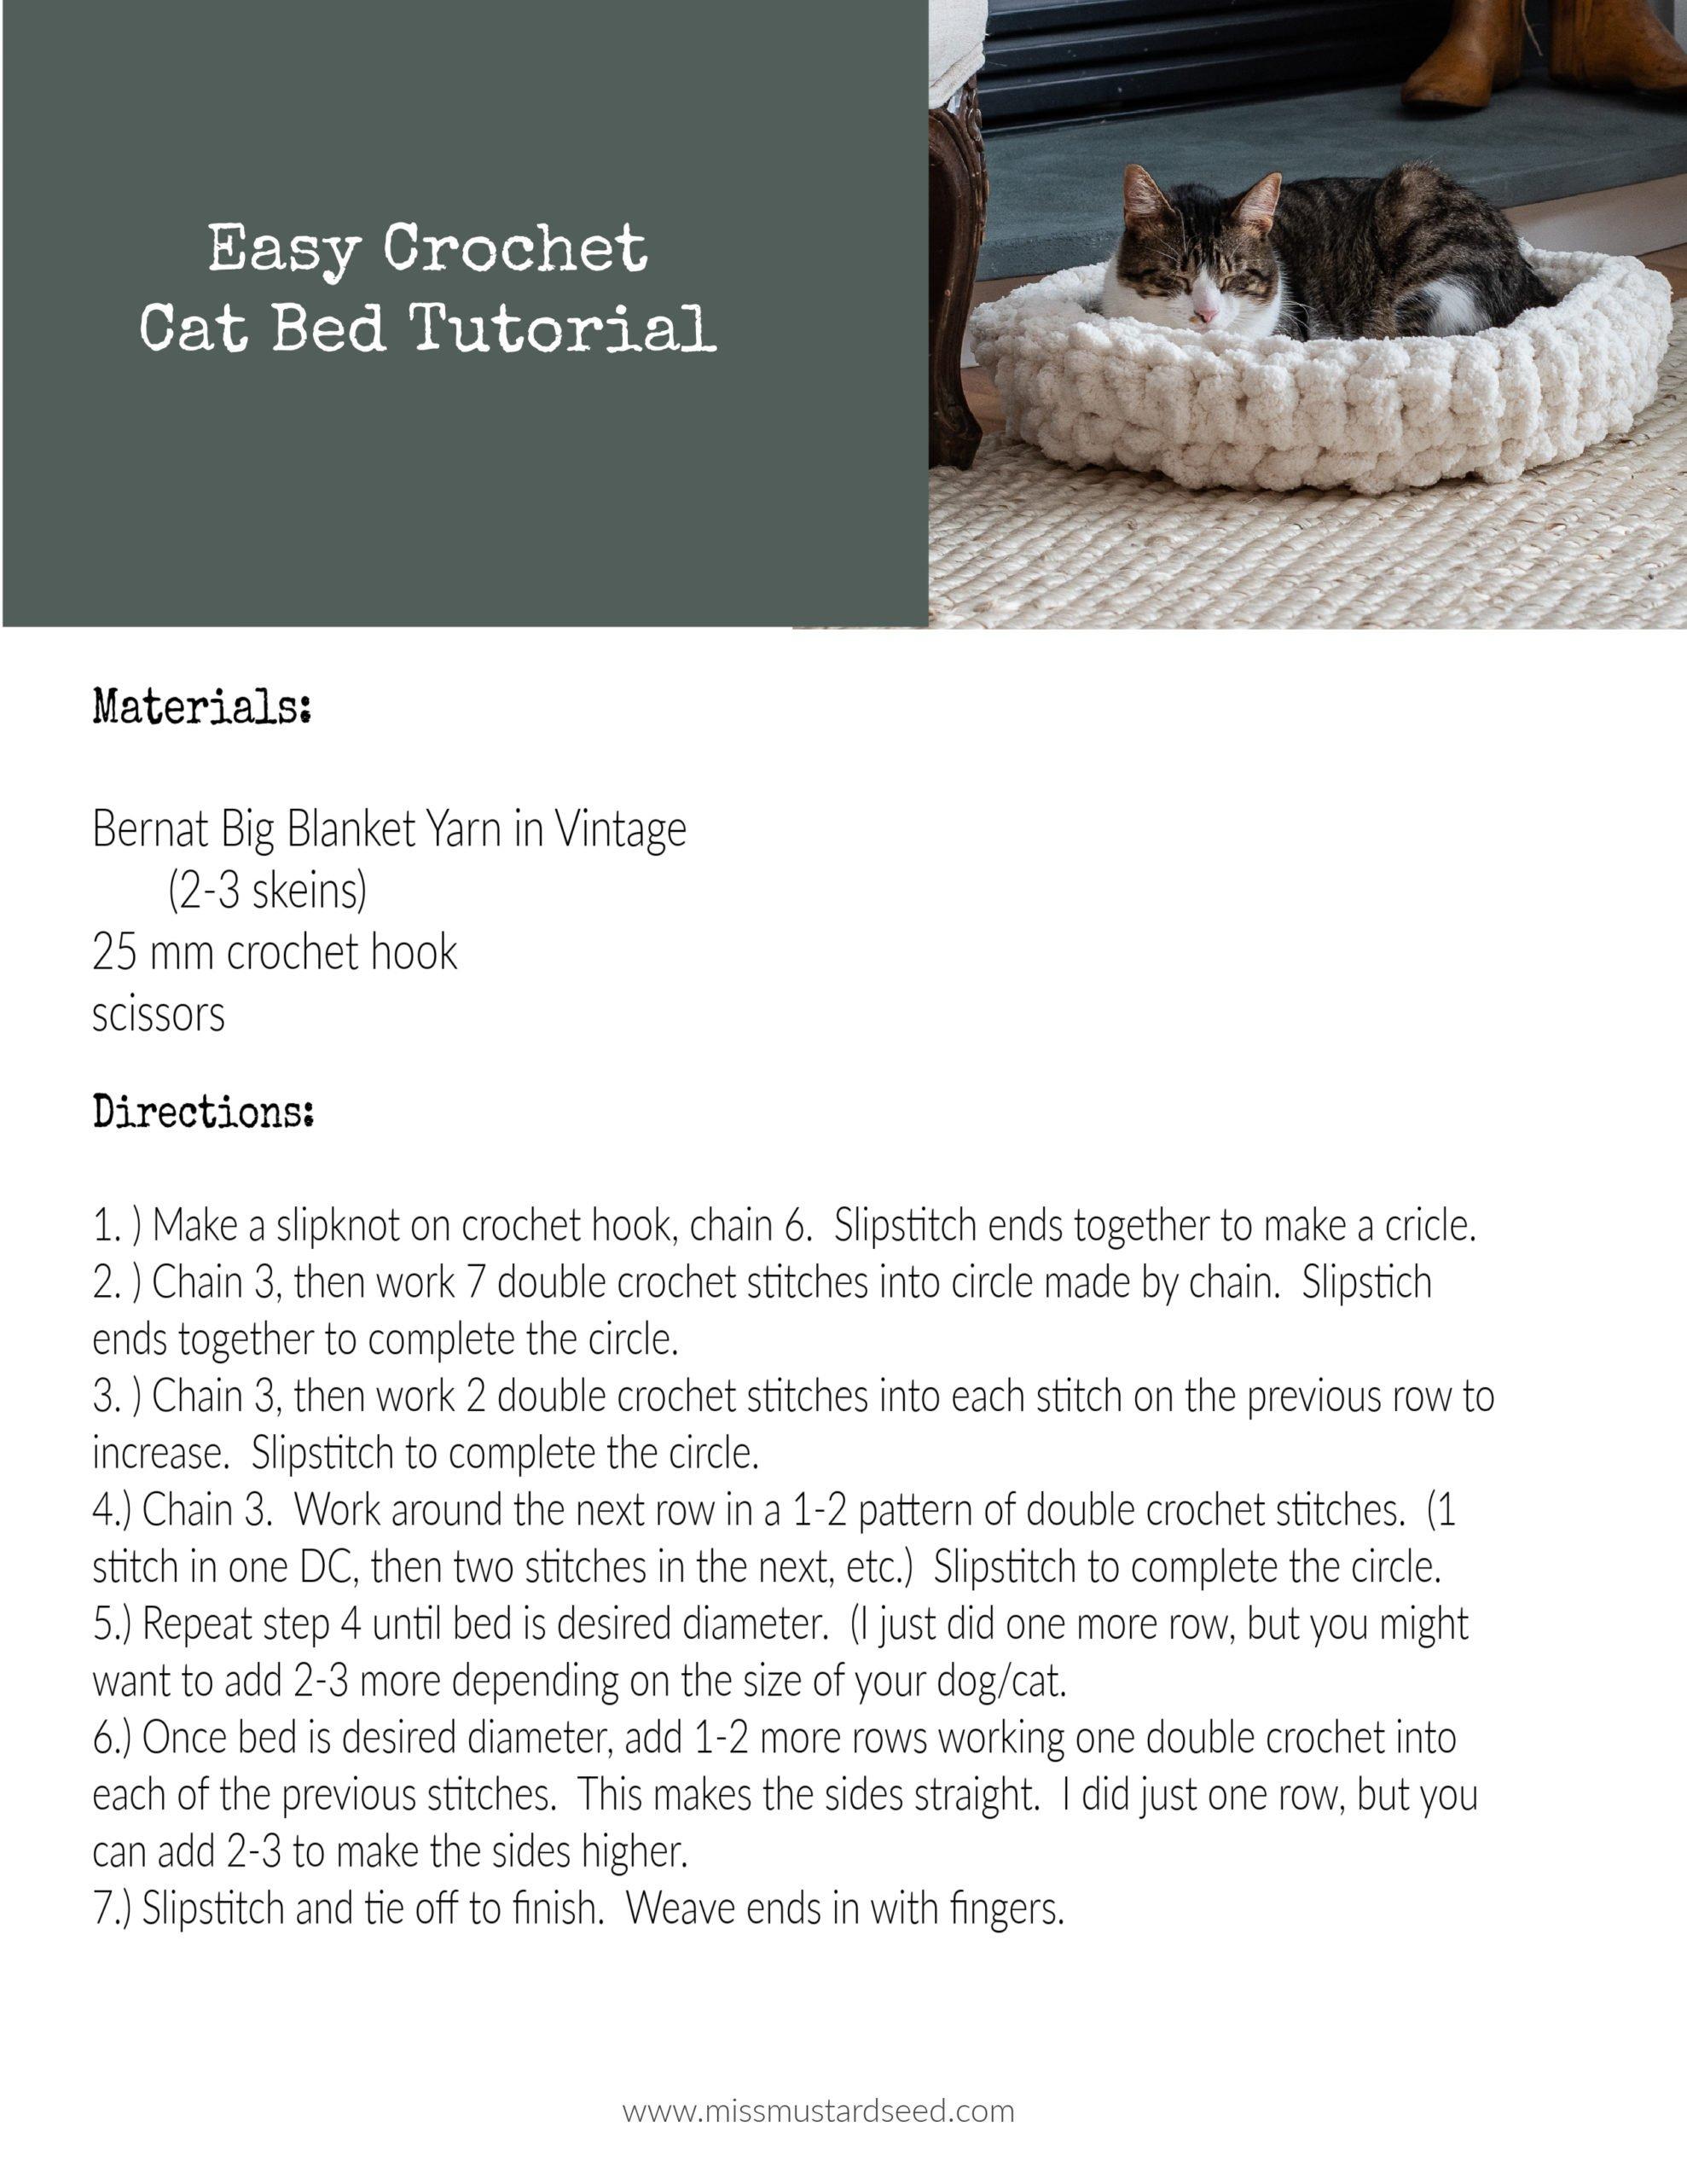 easy free crochet cat bed tutorial & pattern | miss mustard seed